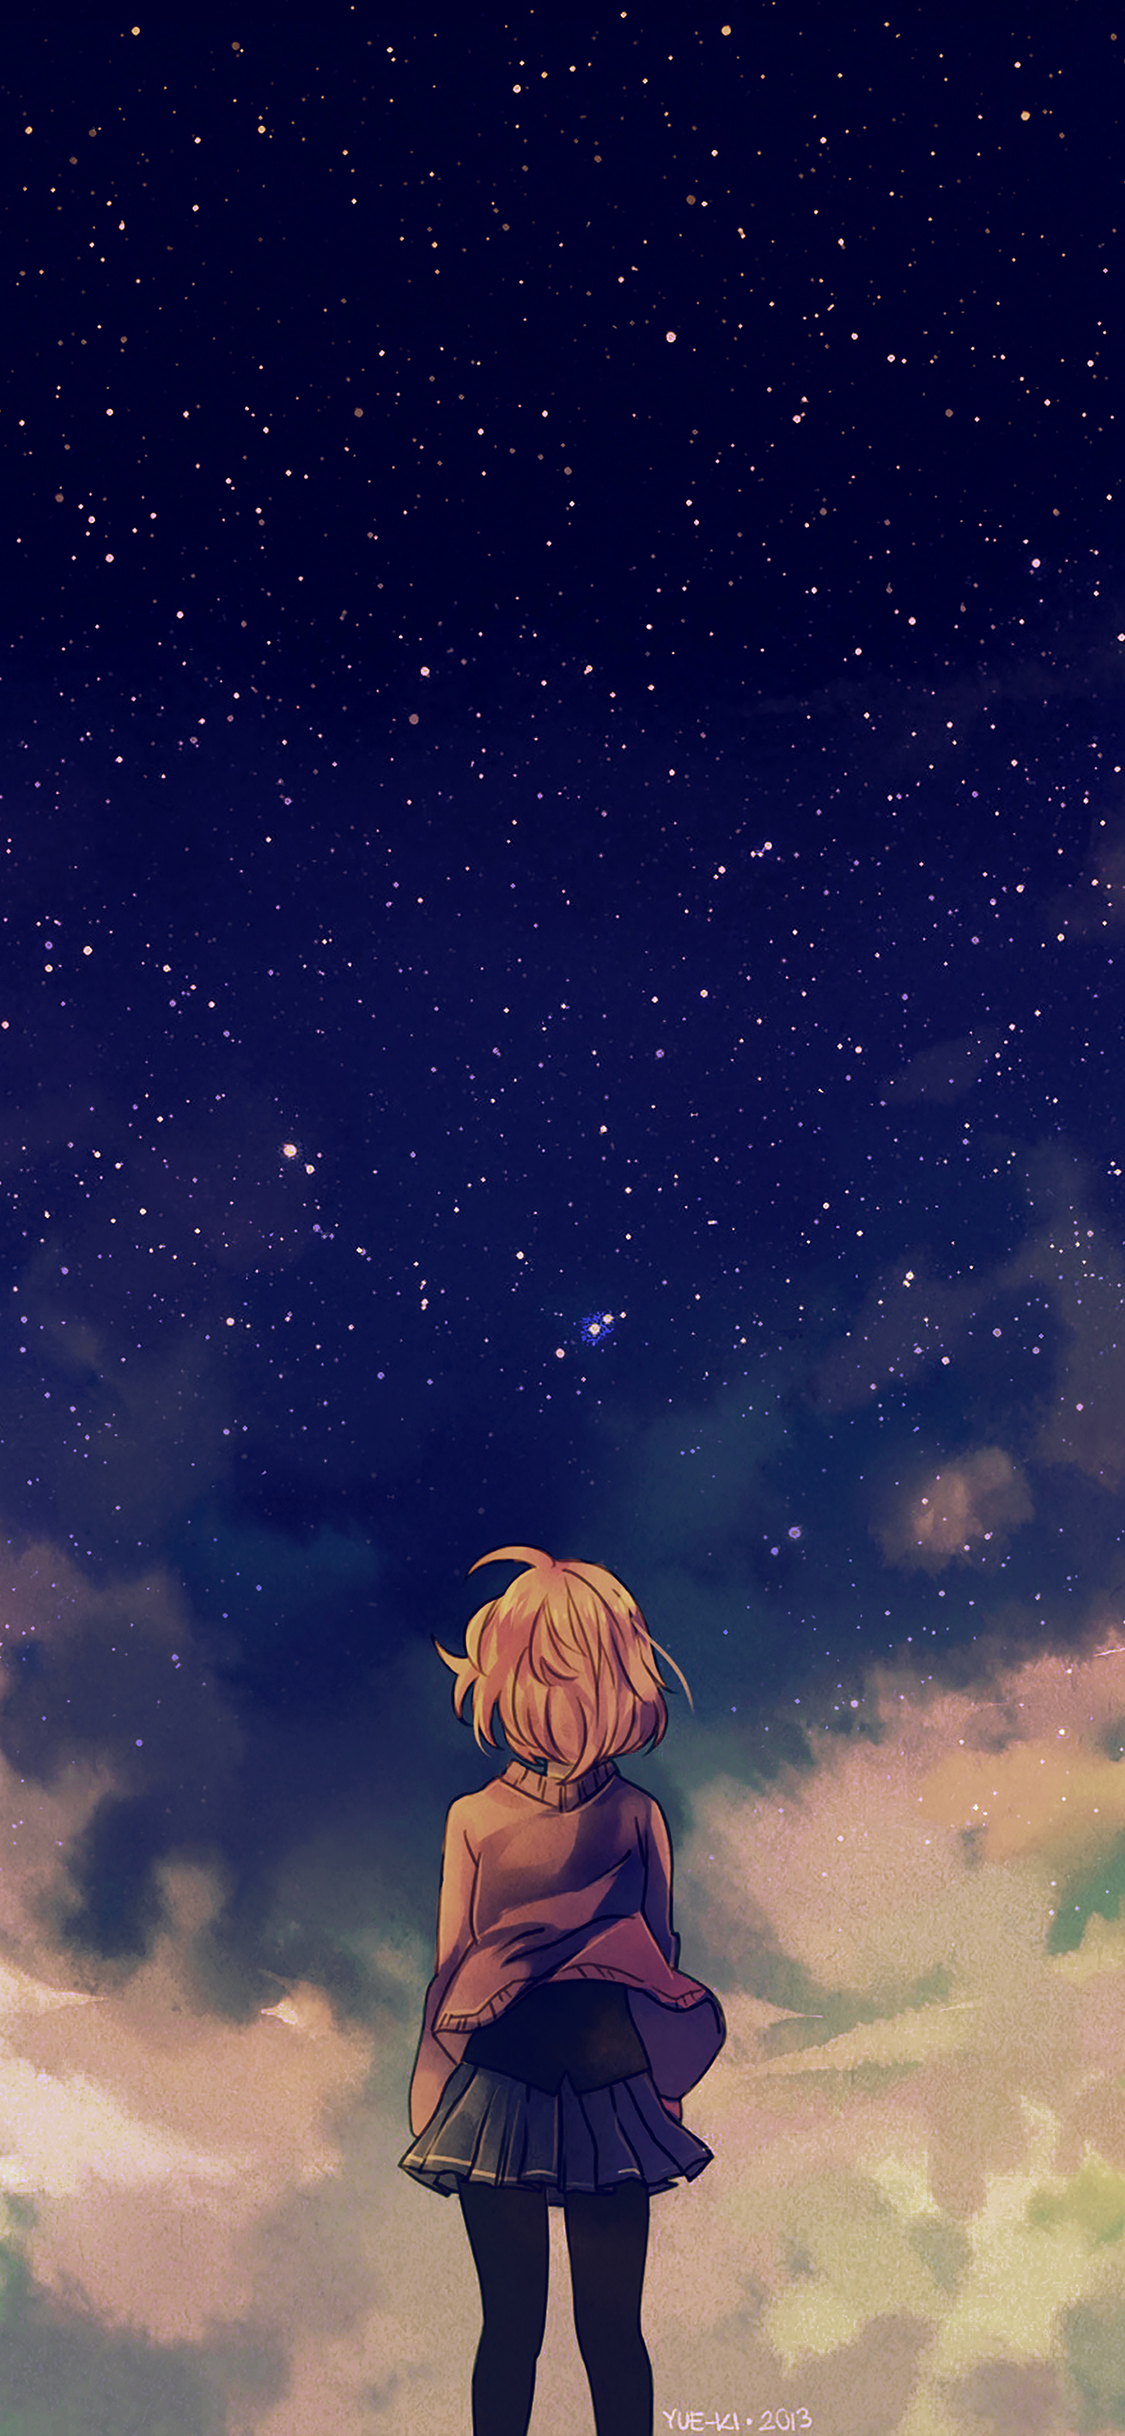 Ad65 Starry Space Illust Anime Girl Wallpaper